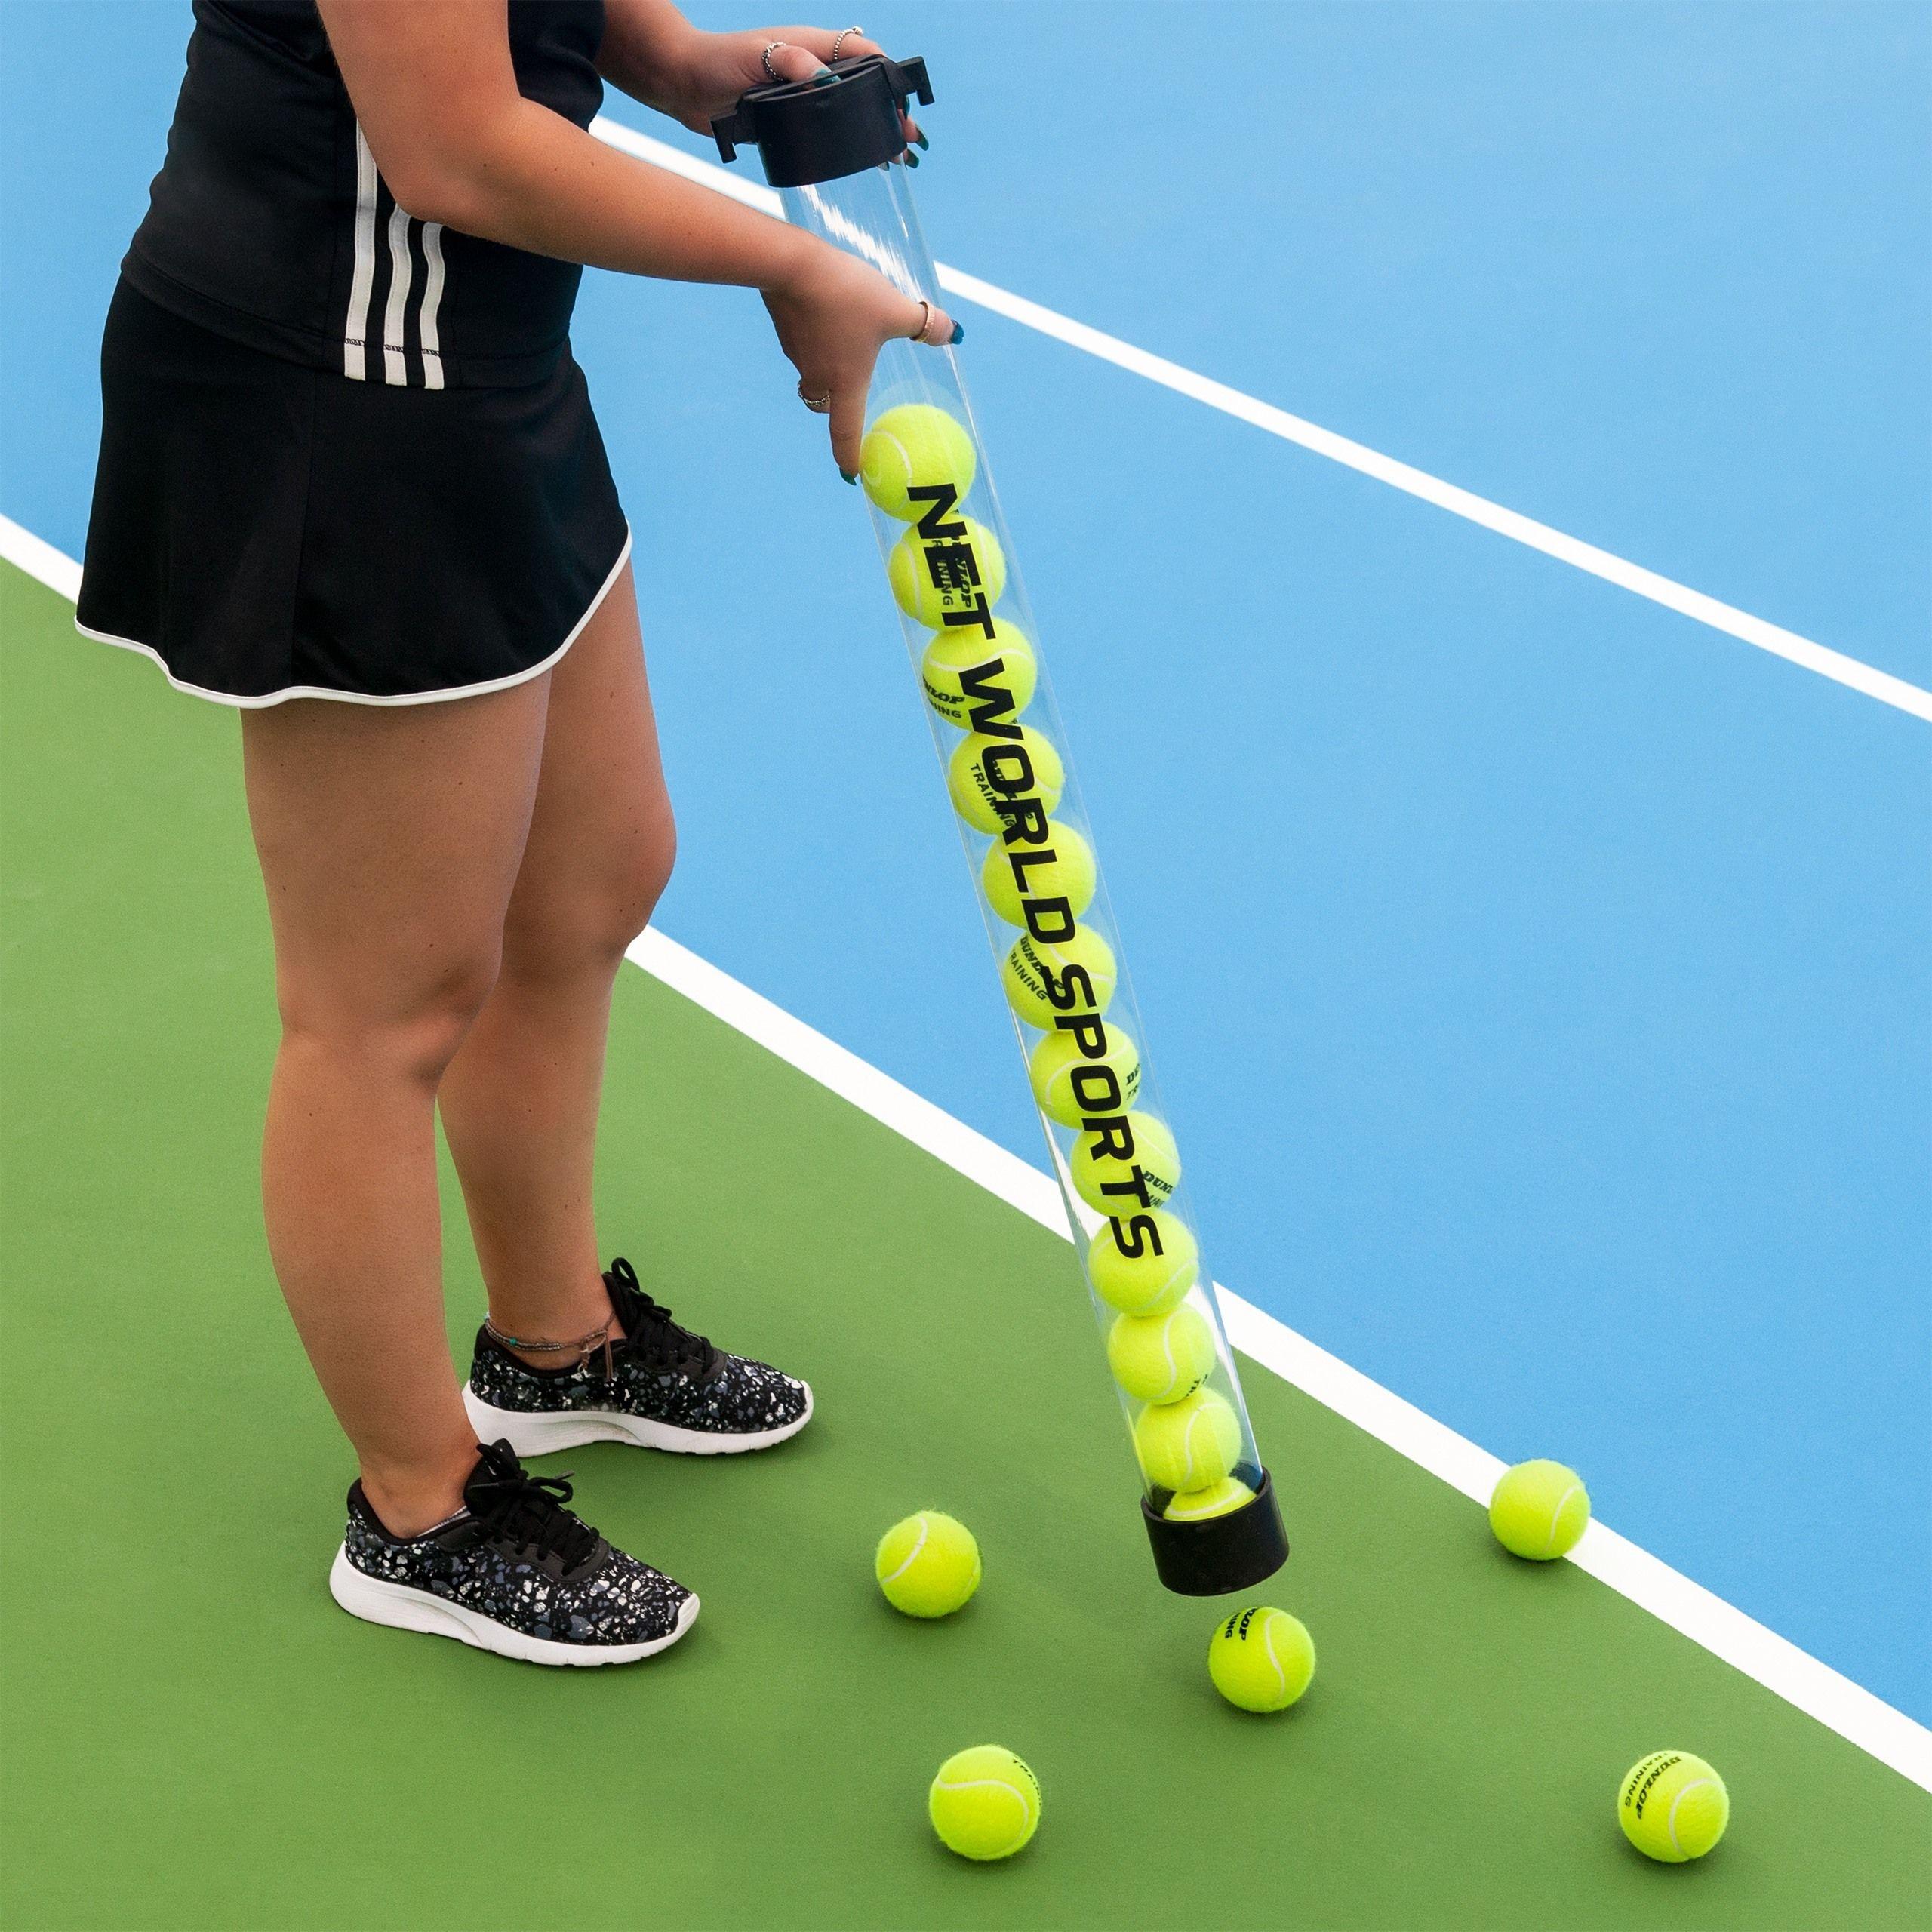 Wilson Tennis Ball Pick Up Tube 18 Ball Capacity